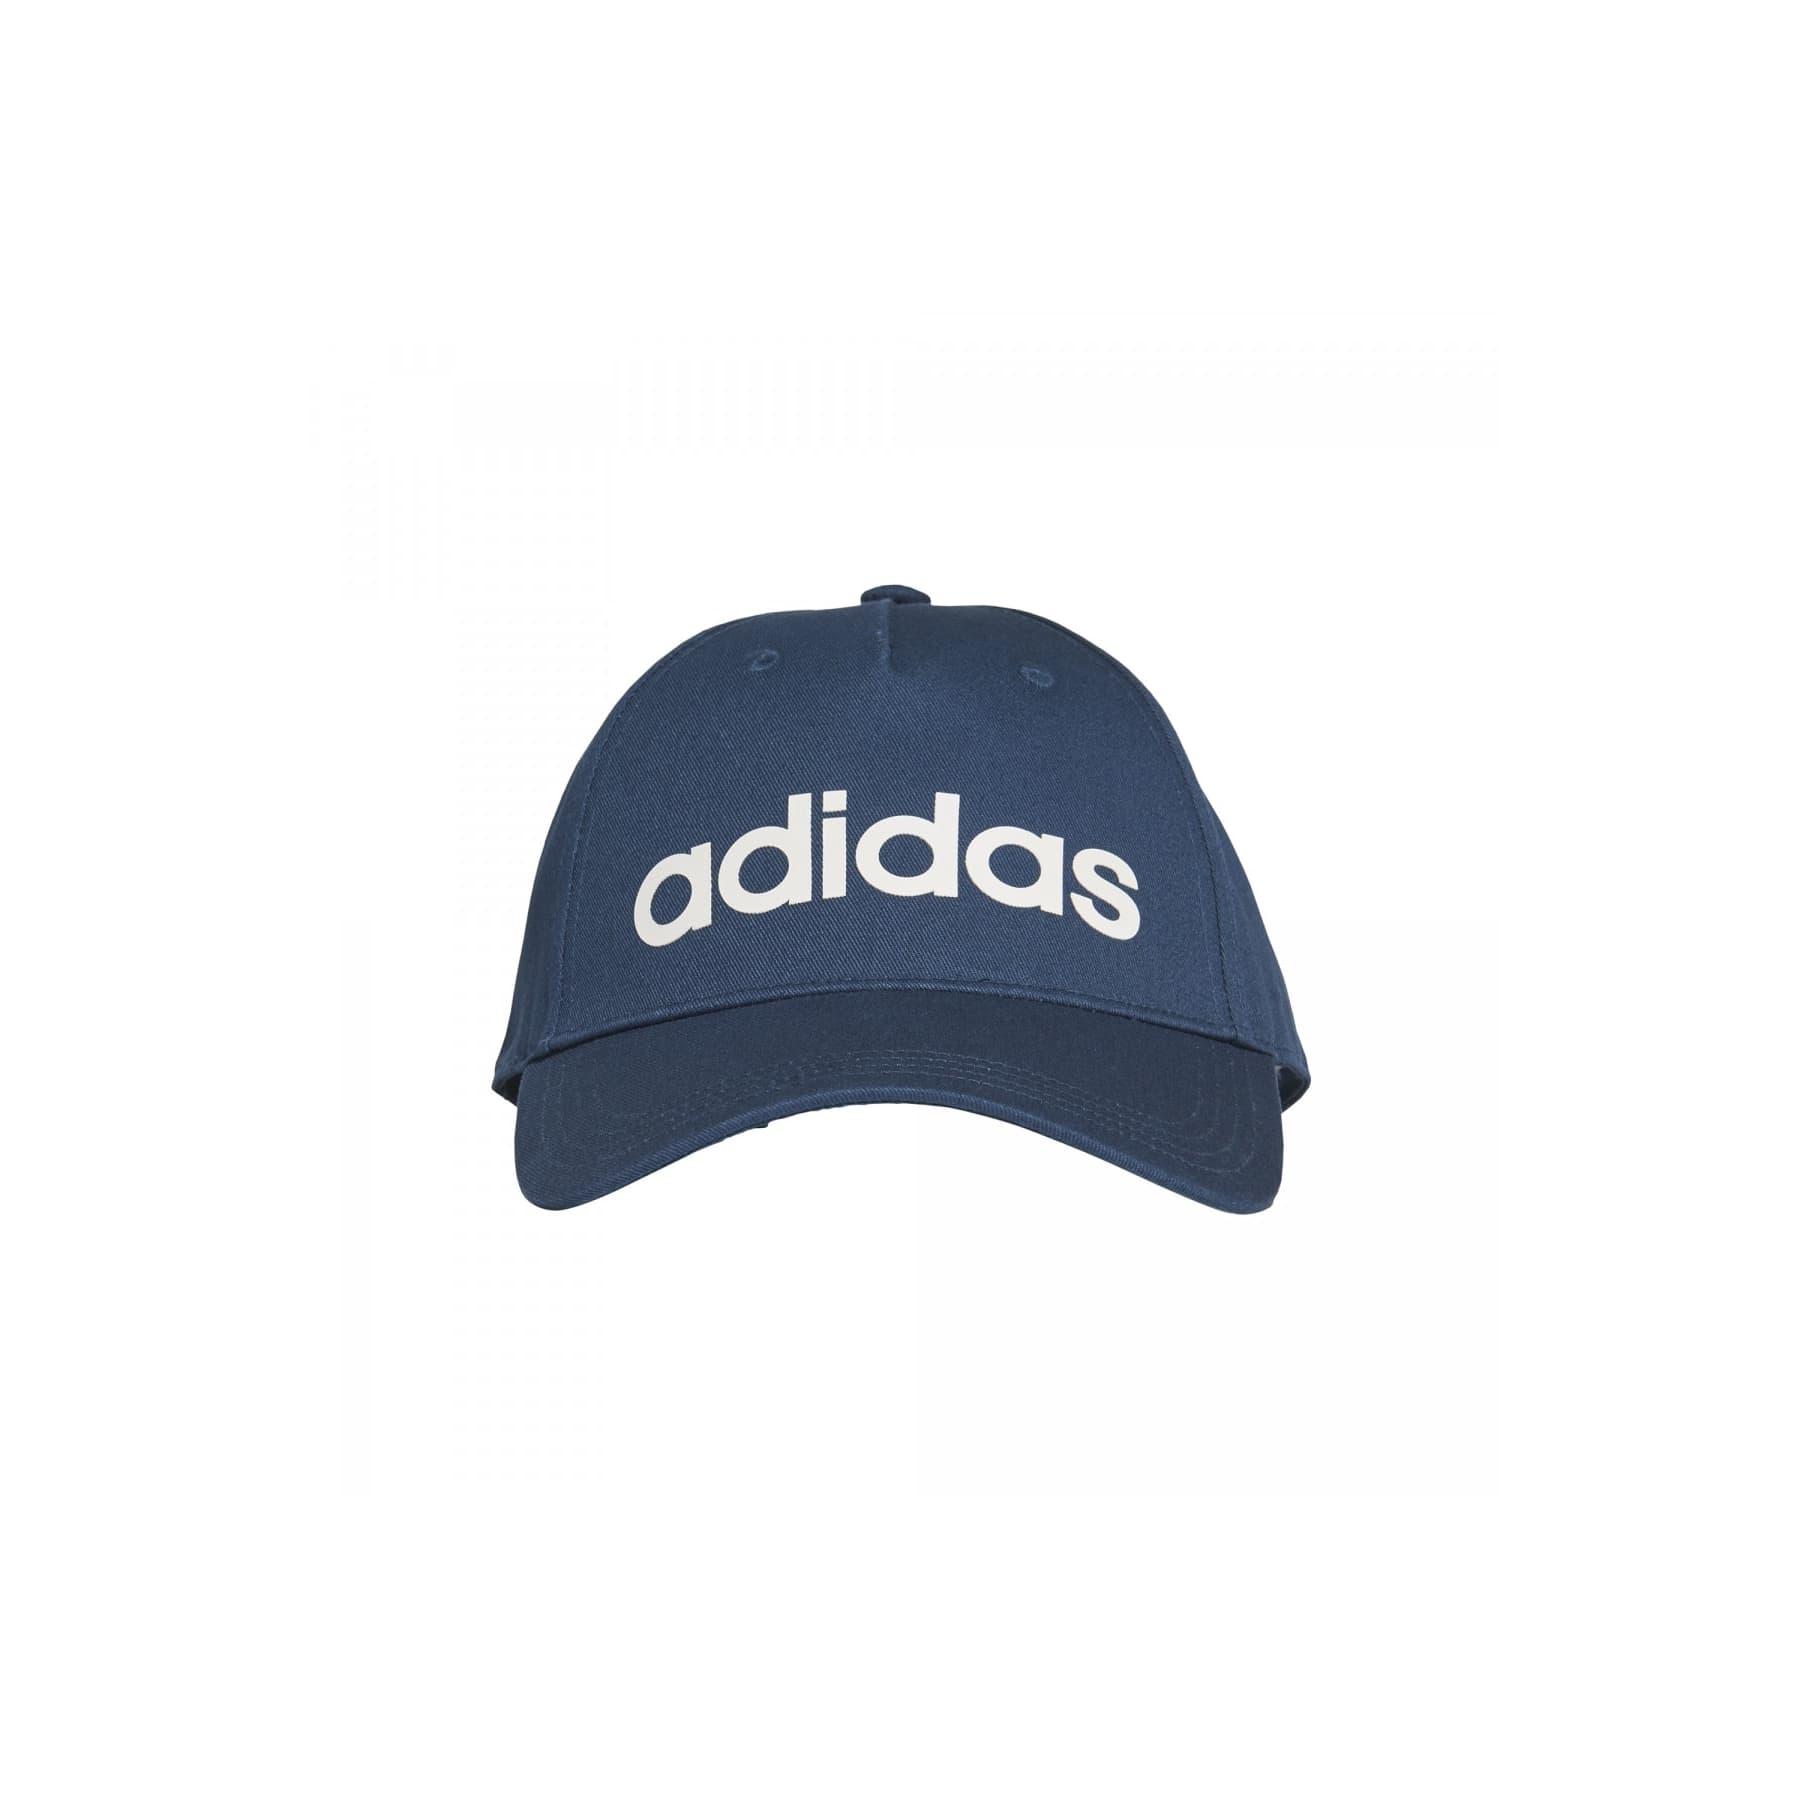 Daily Unisex Mavi Spor Şapka (GN1989)